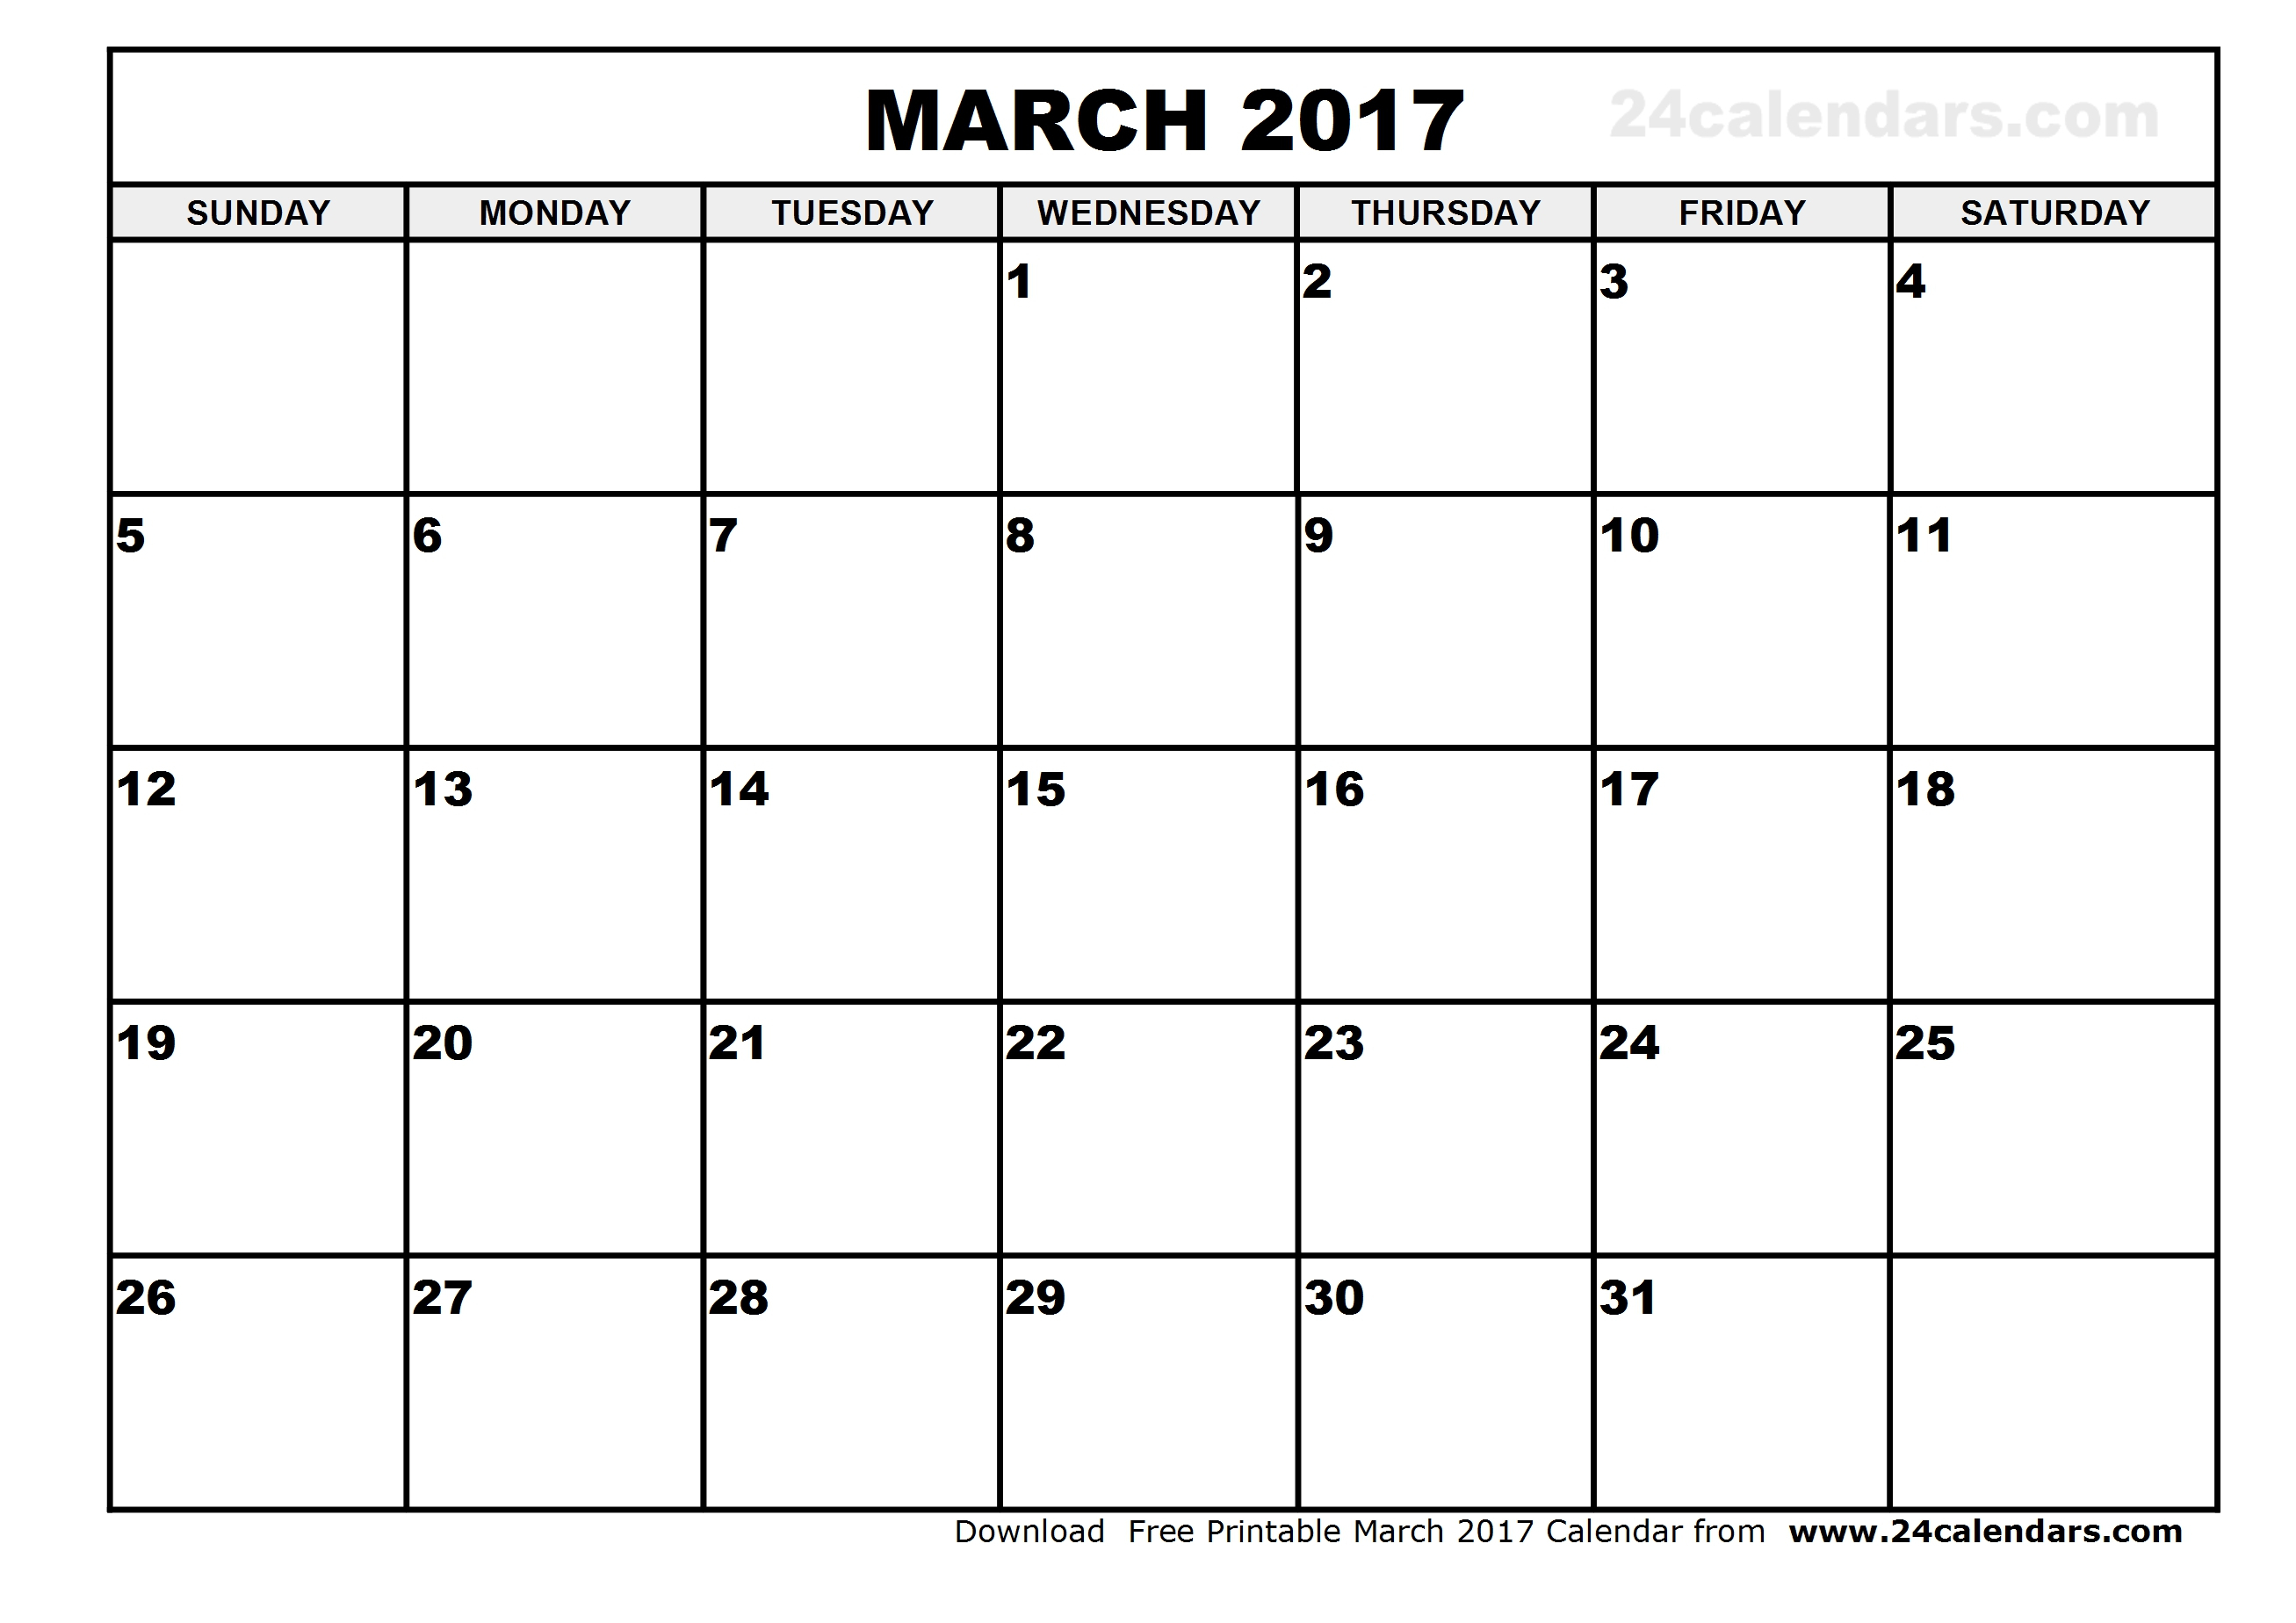 Free-Blank-Printable-March-2017-Calendar-Printable pertaining to Free Printable Blank Calendars